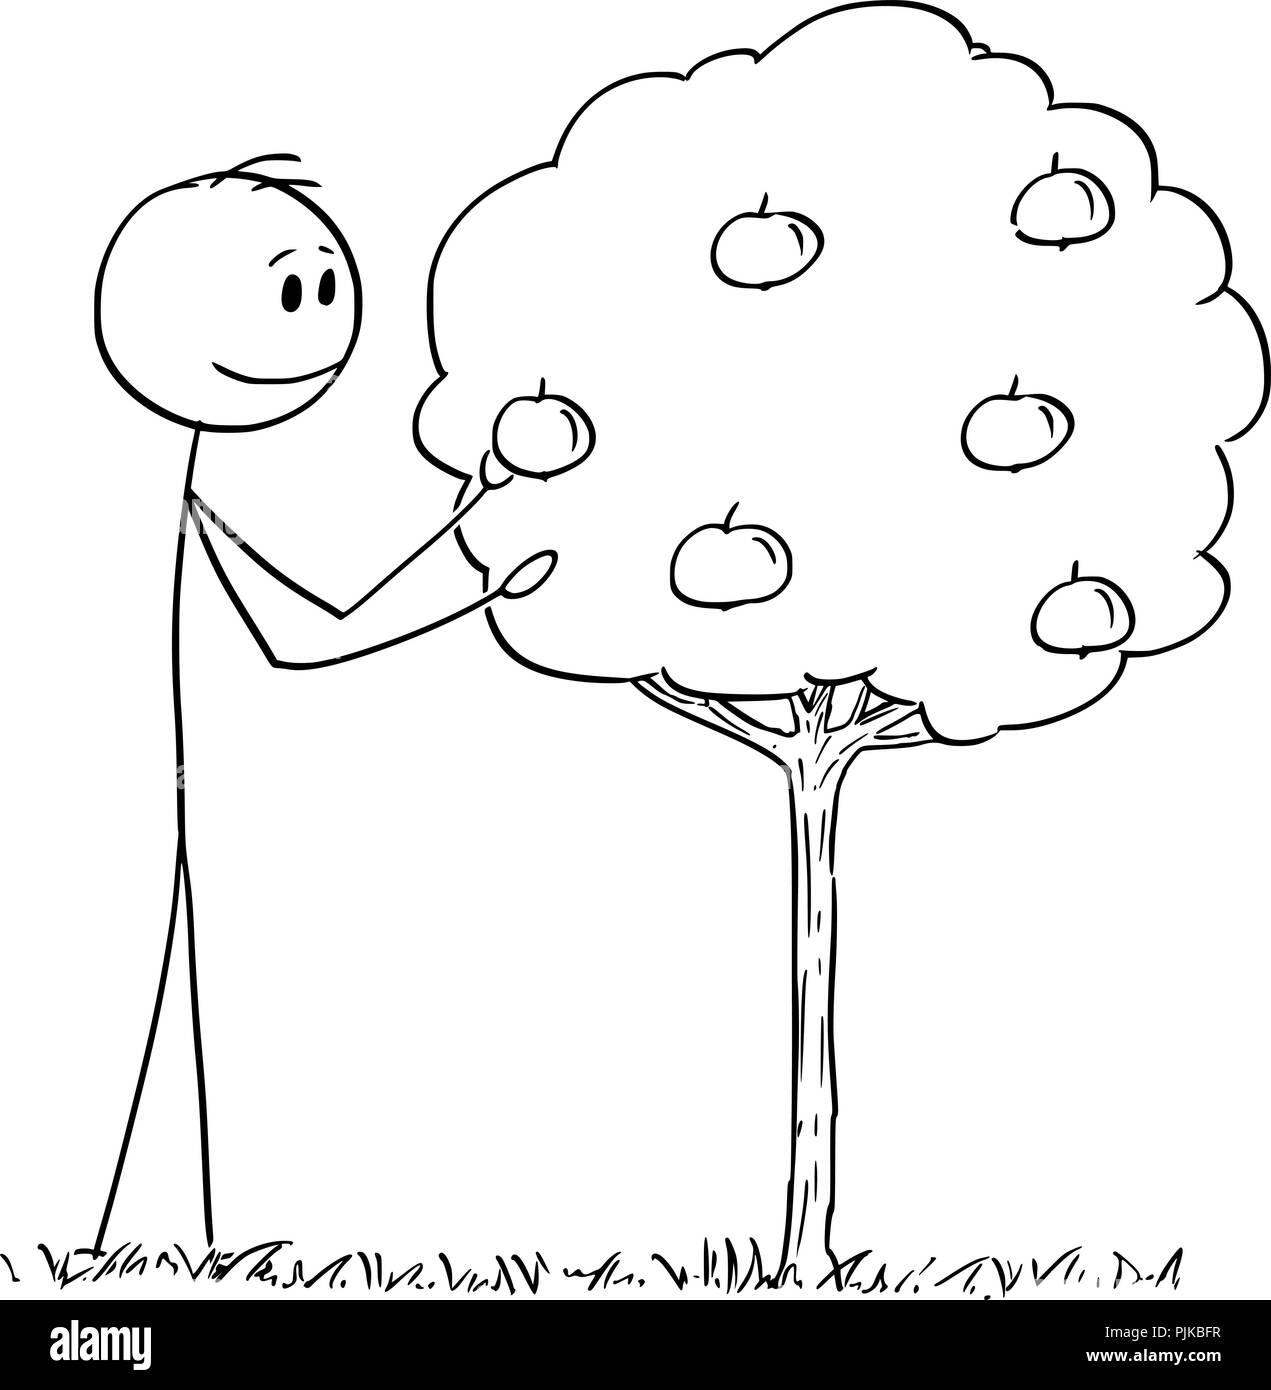 Cartoon of Man Picking Fruit From Small Apple Tree - Stock Vector